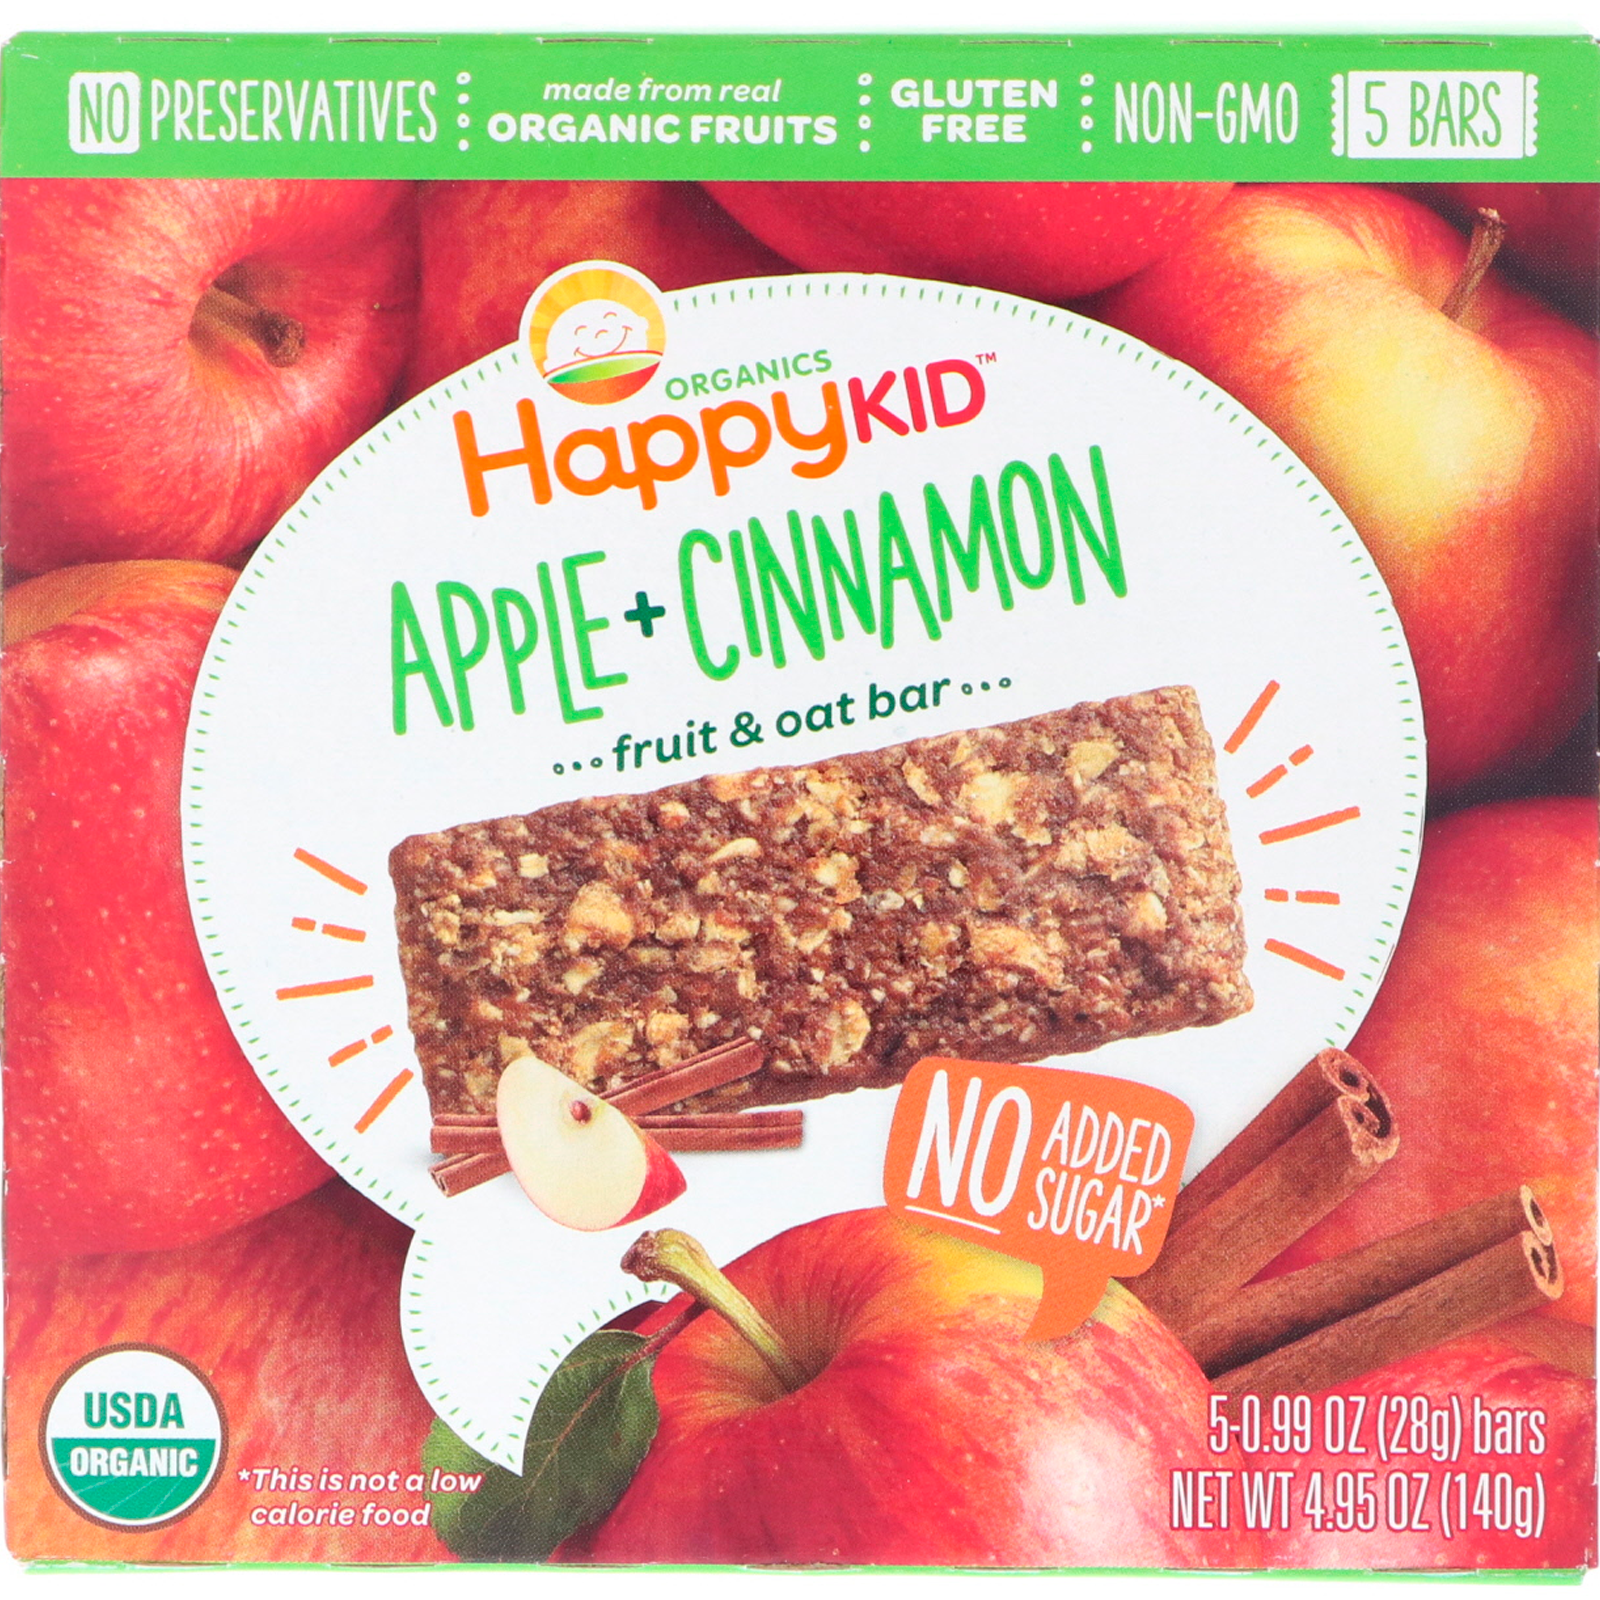 3fd31108389 Happy Family Organics, Happy Kid, Apple + Cinnamon, Fruit & Oat Bar, 5  Bars, 0.99 oz (28 g) Each